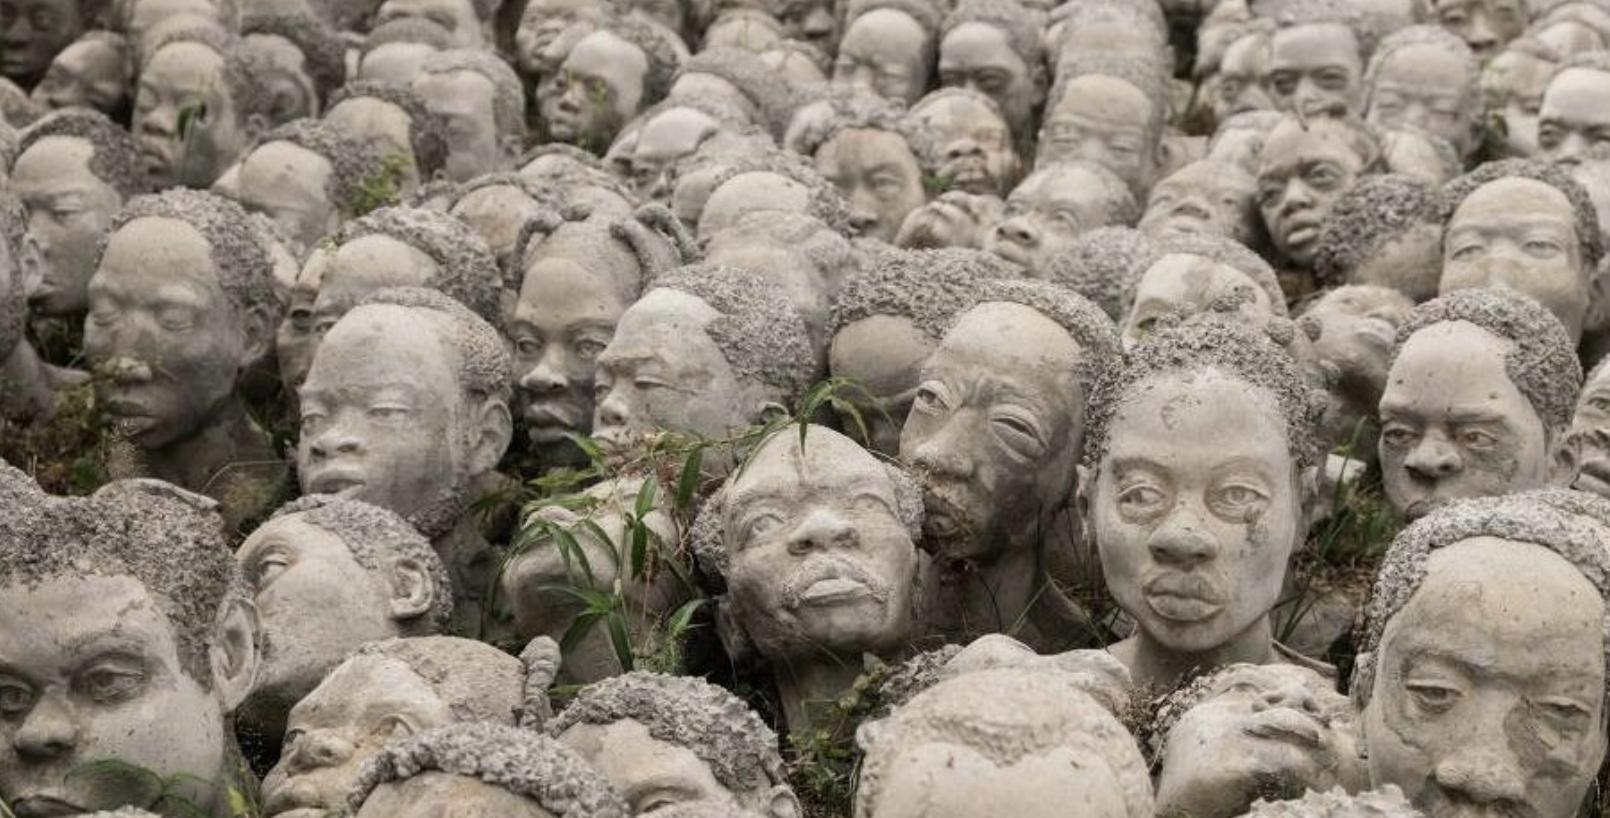 8. Kwame Akoto-Bamfo